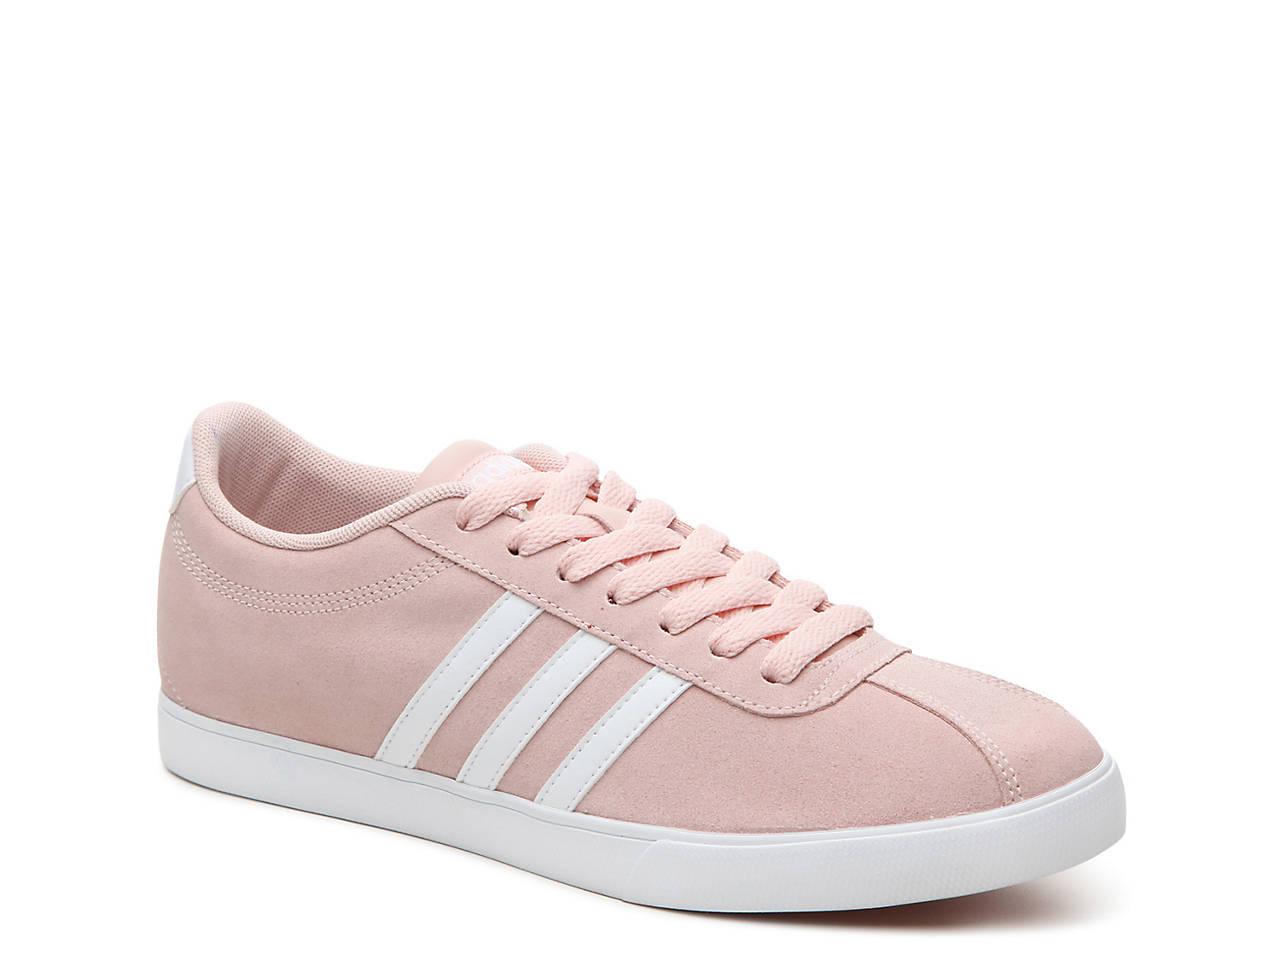 NEO Courtset Sneaker - Womens